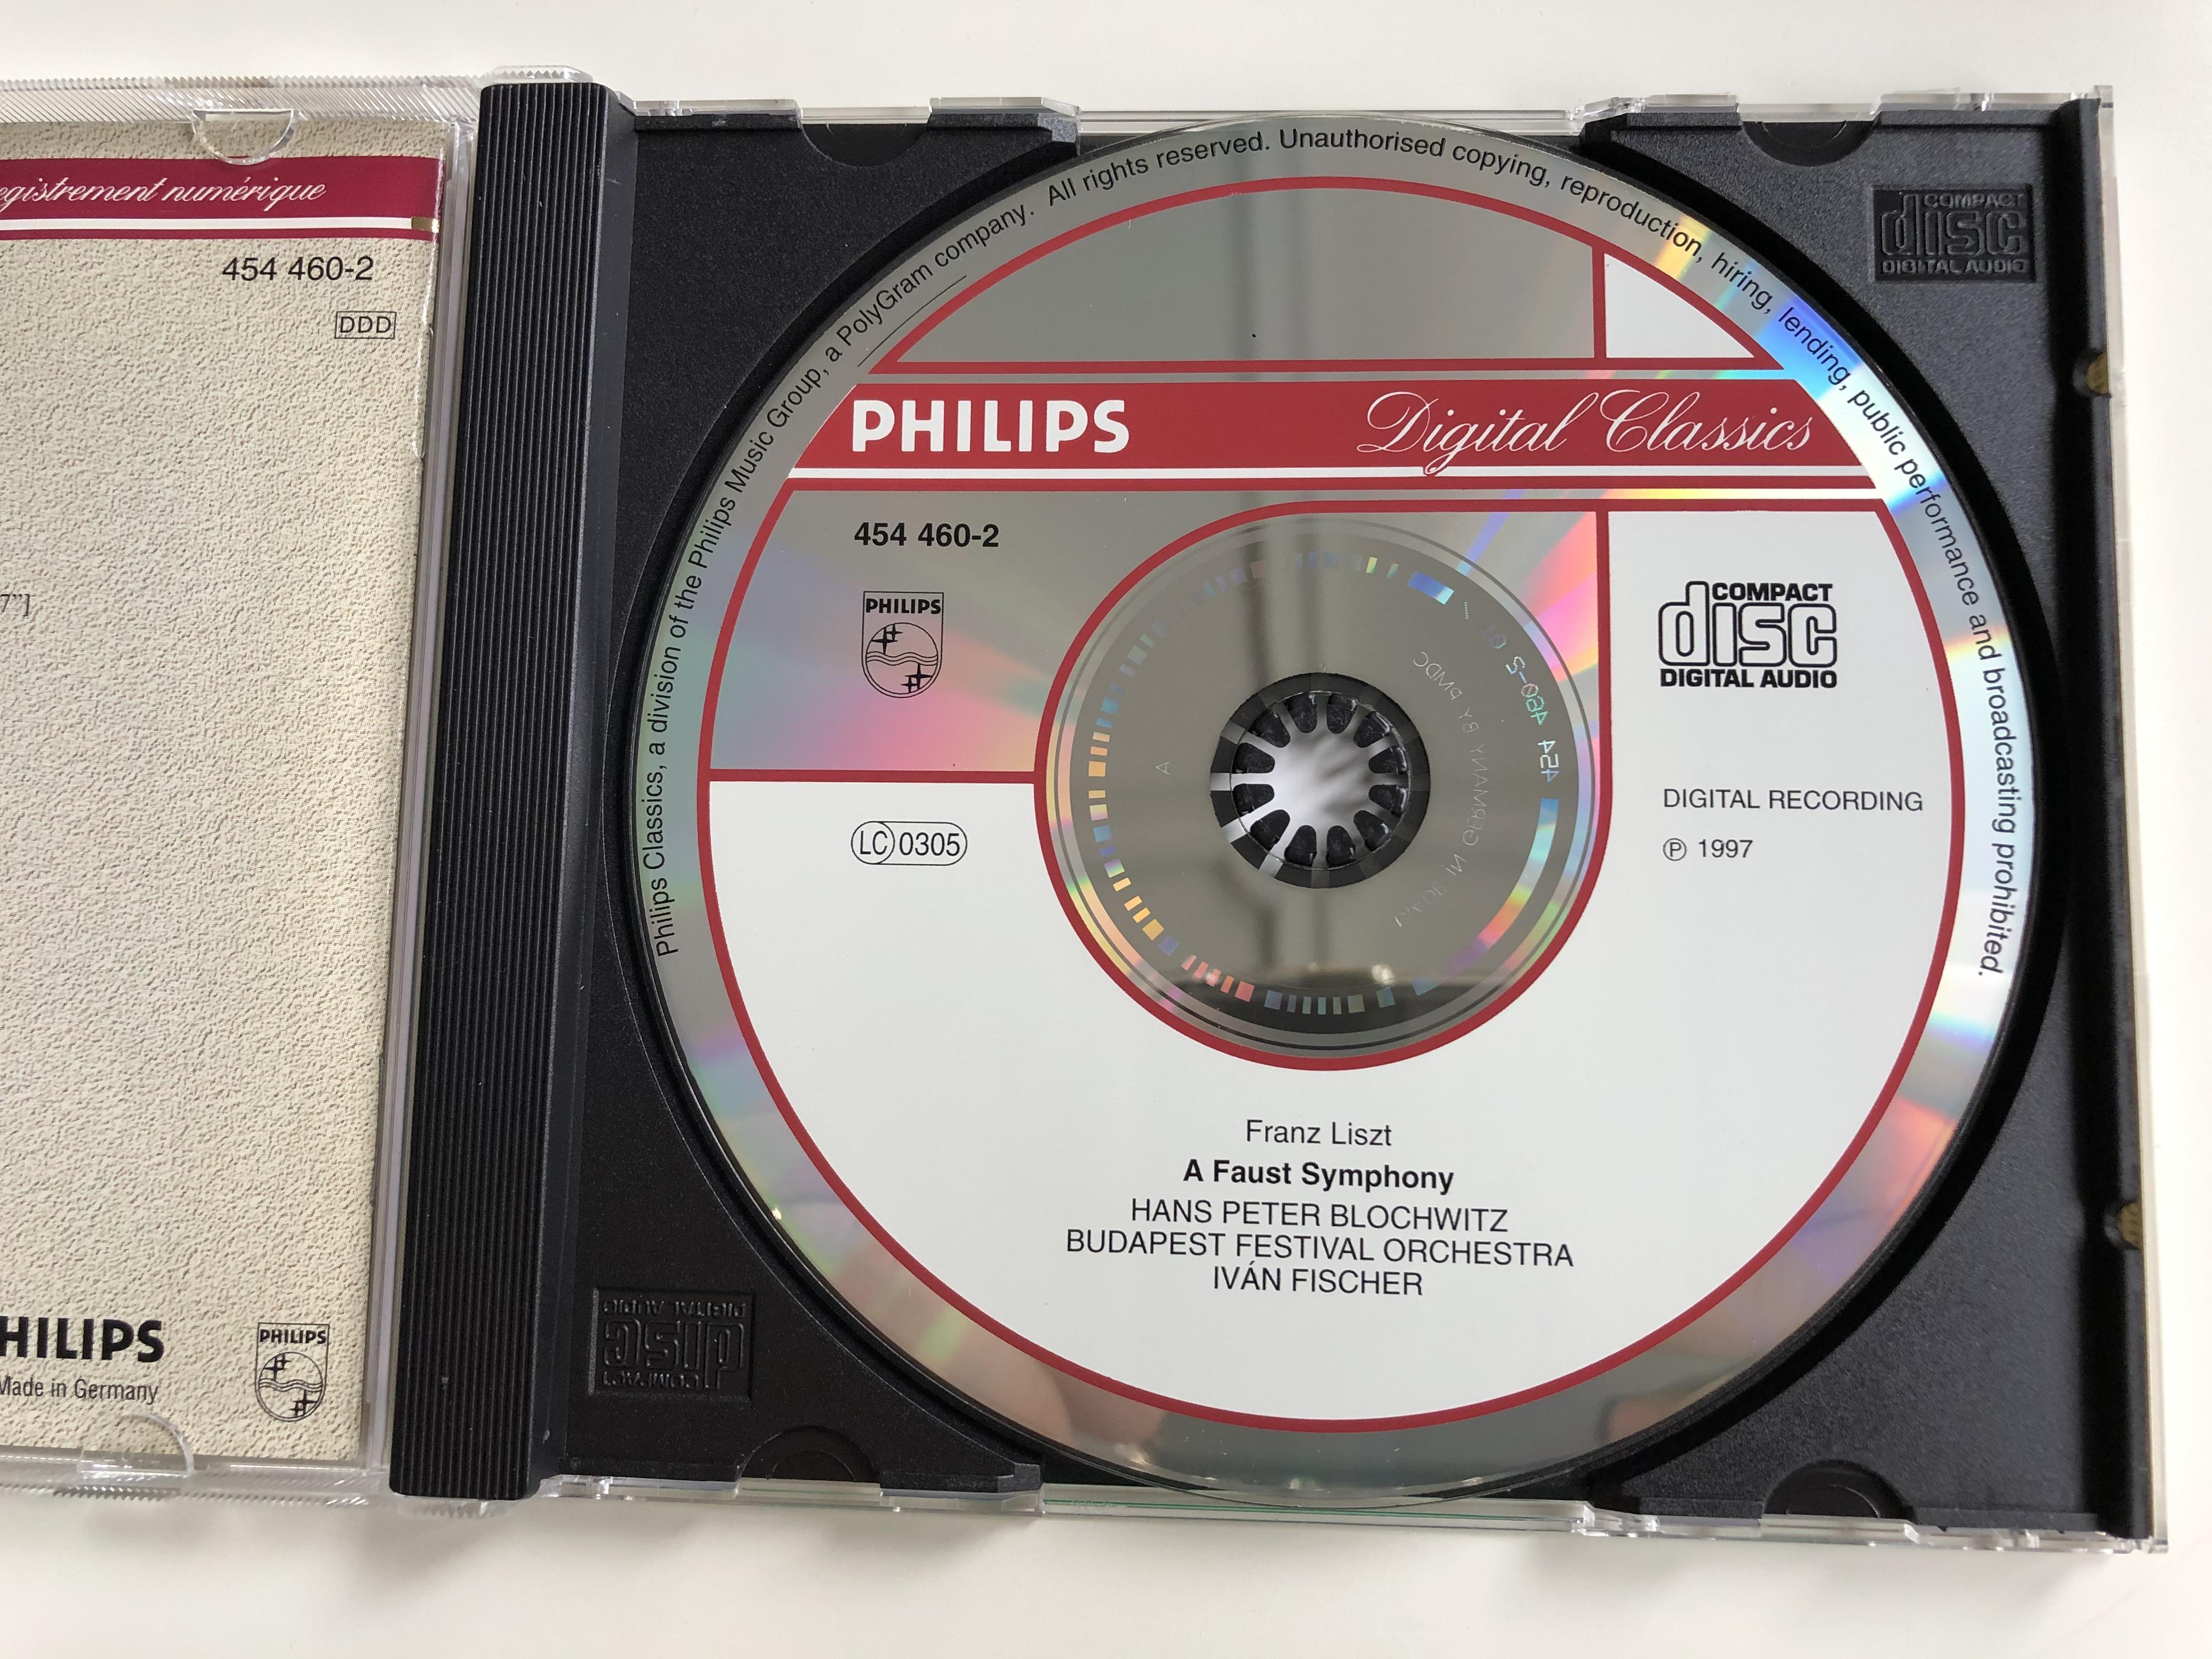 liszt-a-faust-symphony-iv-n-fischer-hans-peter-blochwitz-budapest-festival-orchestra-philips-audio-cd-1997-454-460-2-3-.jpg